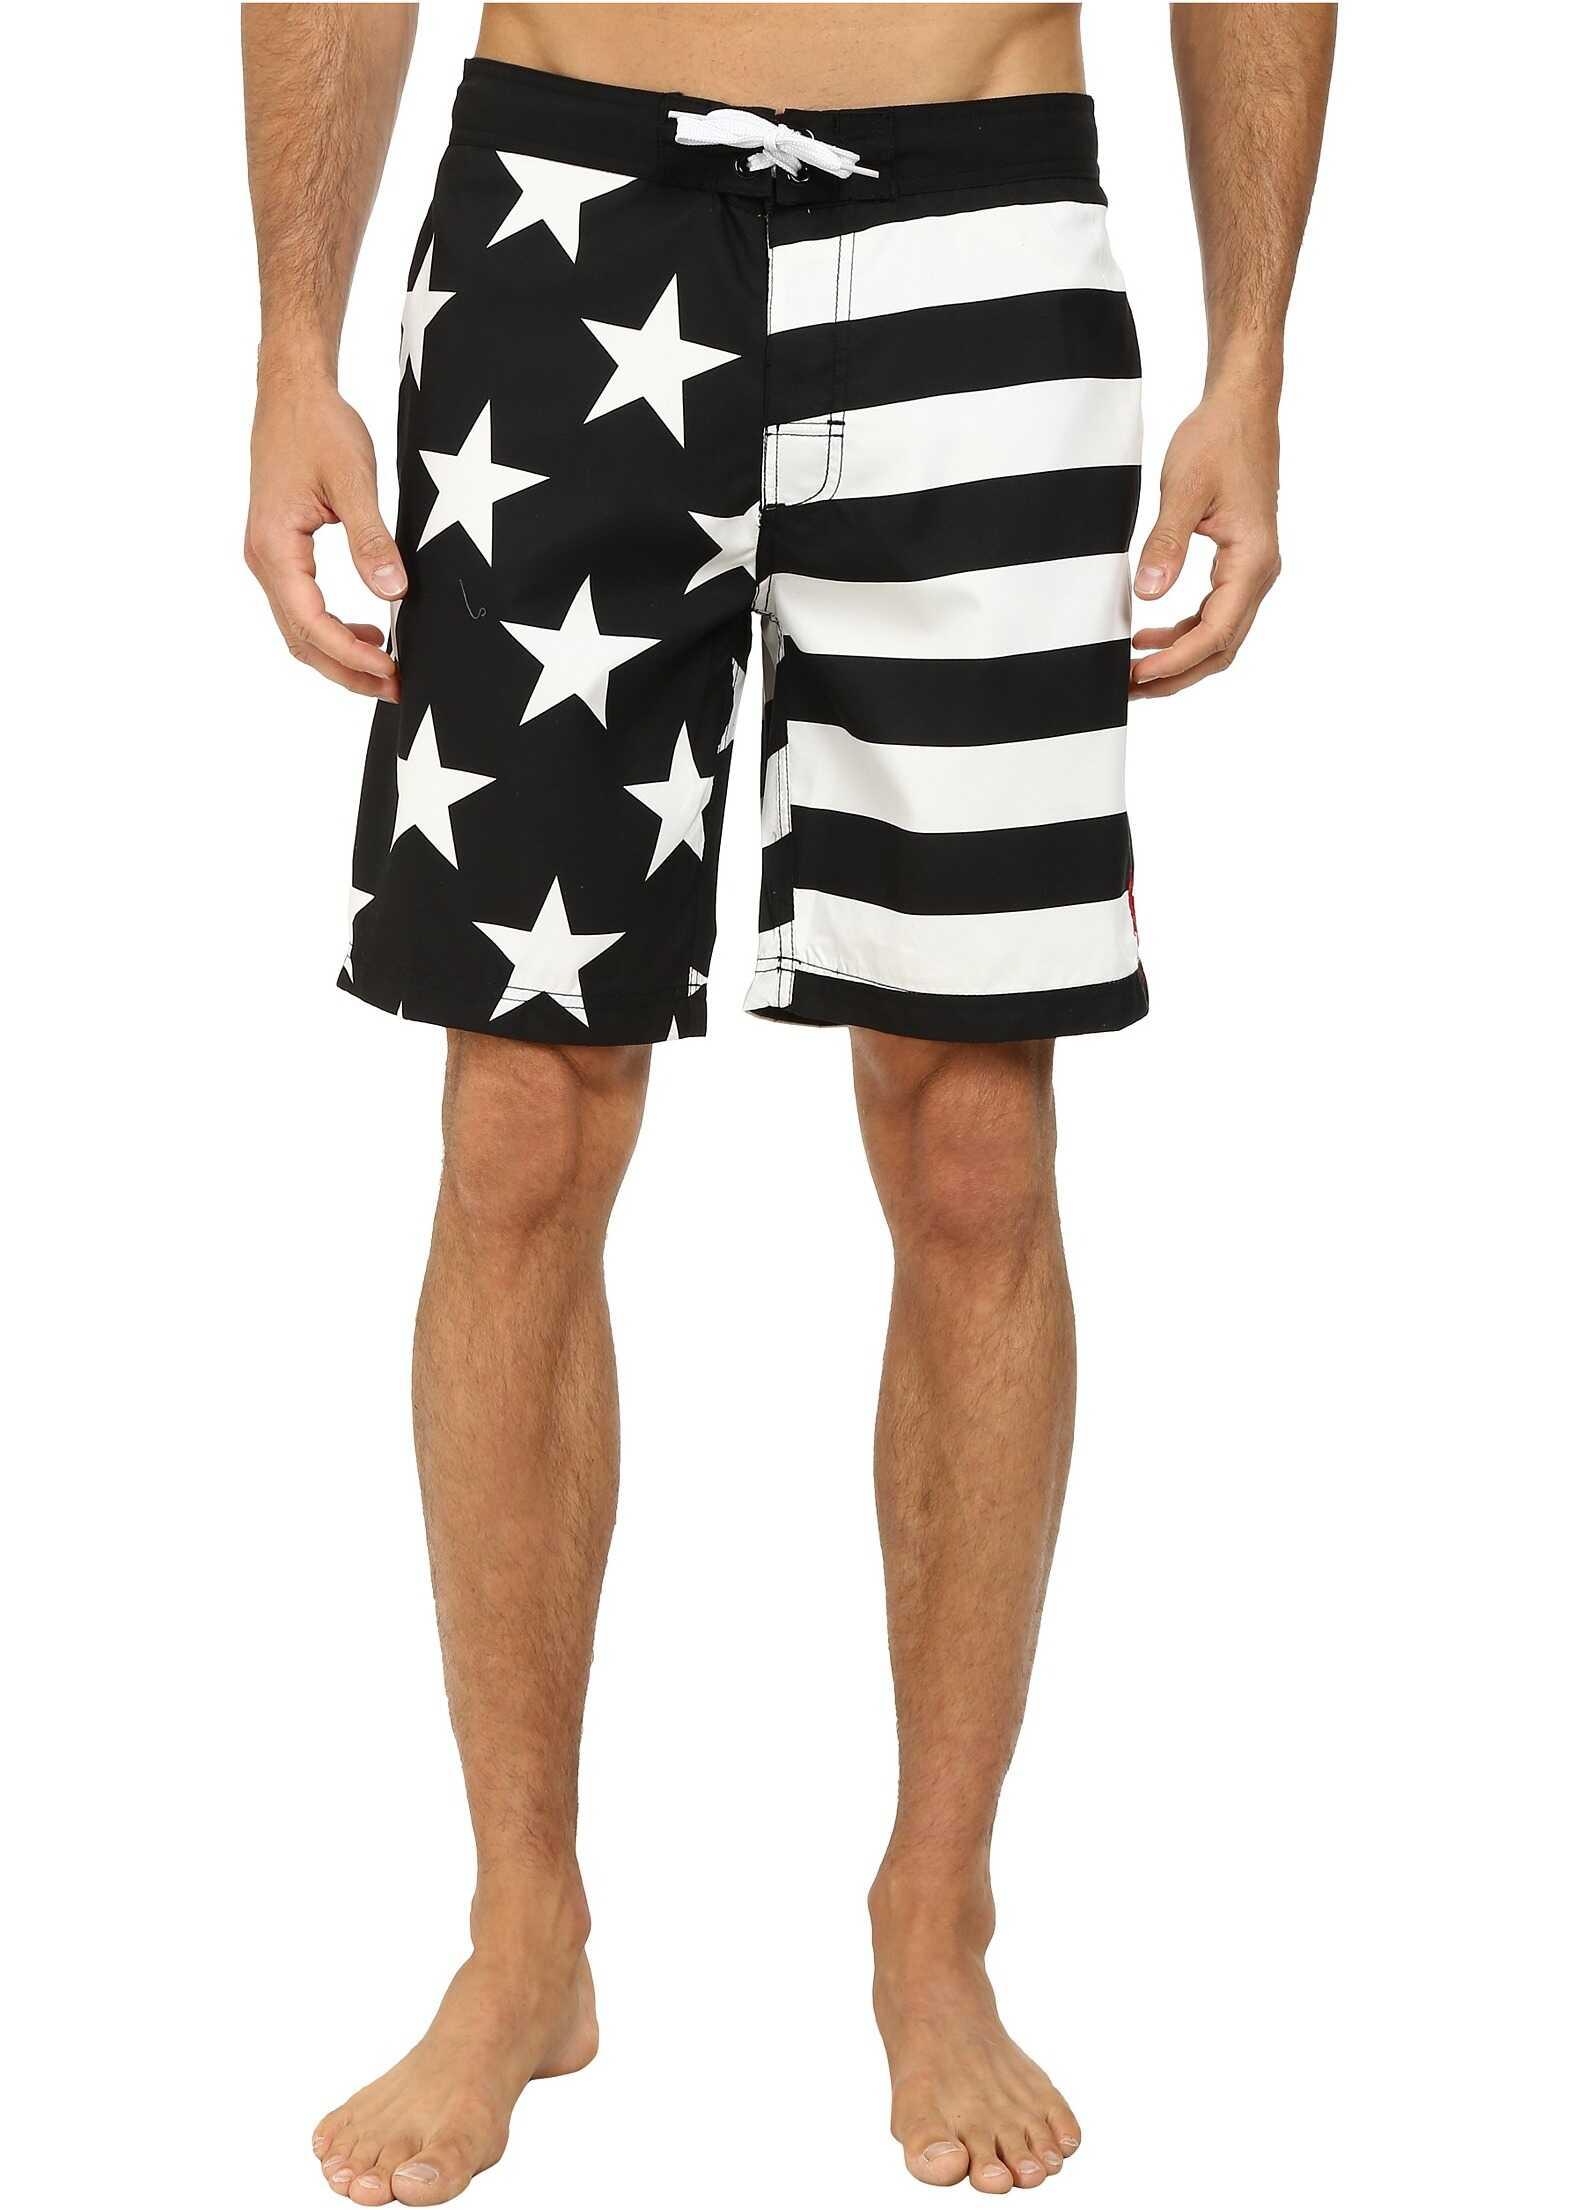 U.S. POLO ASSN. Americana Boardshorts Black